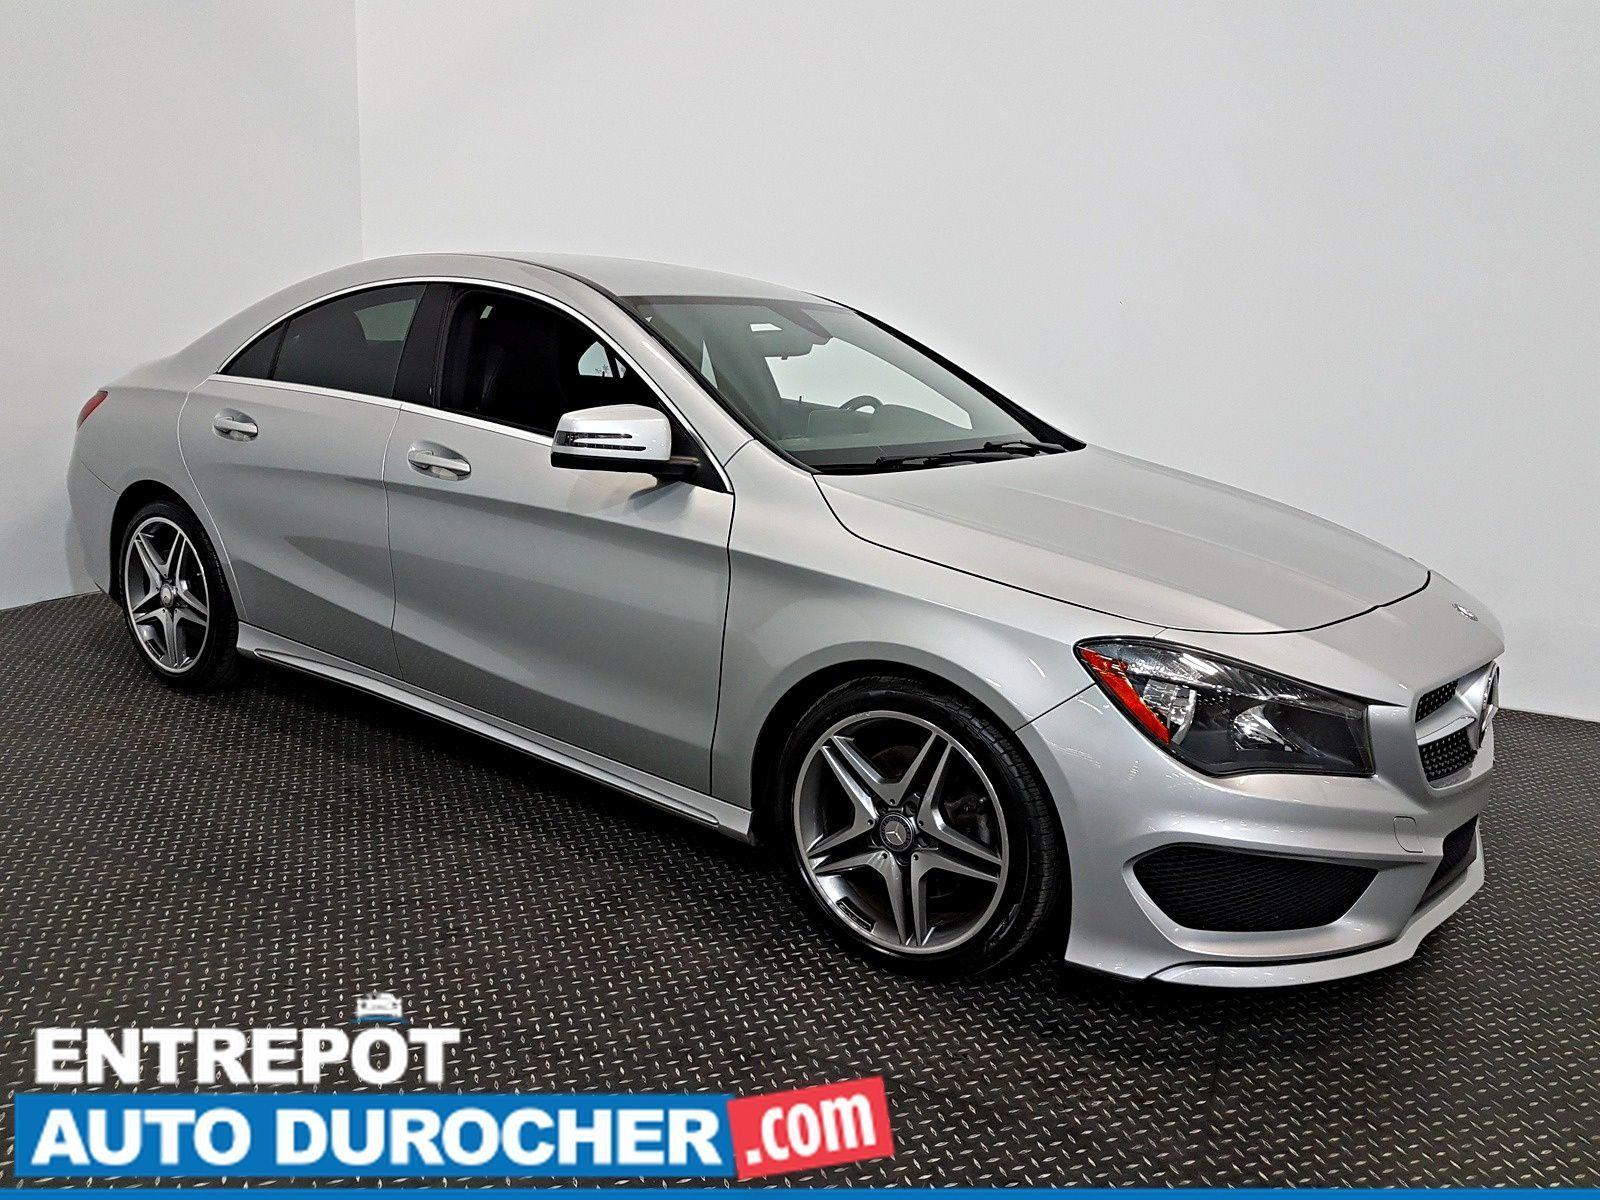 Auto Durocher | Used Mercedes-Benz CLA-Class 2015 for sale